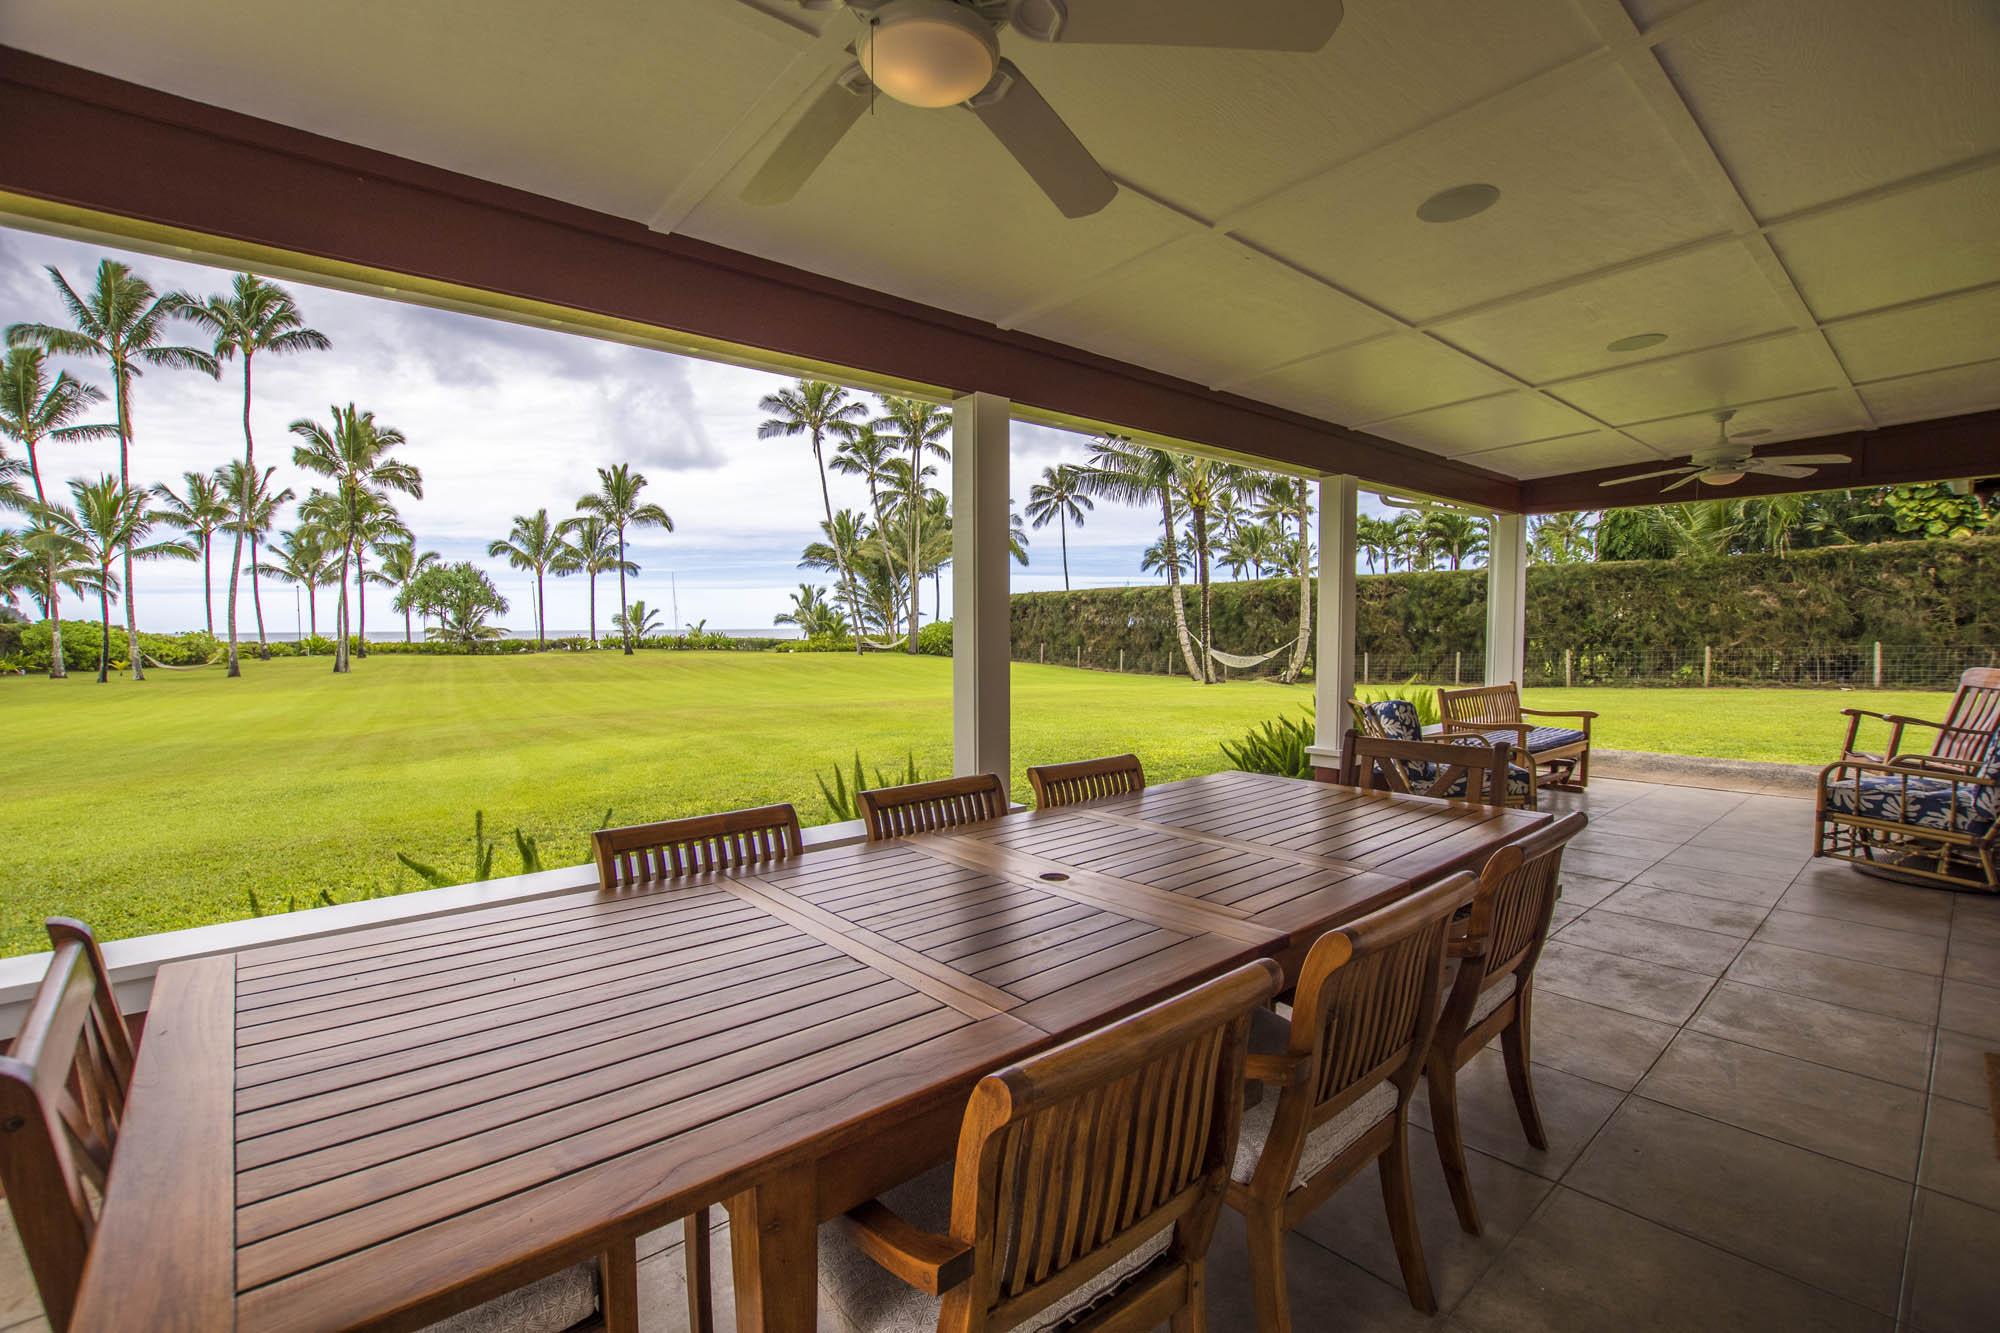 Kauai-217-Hanalei Bay39